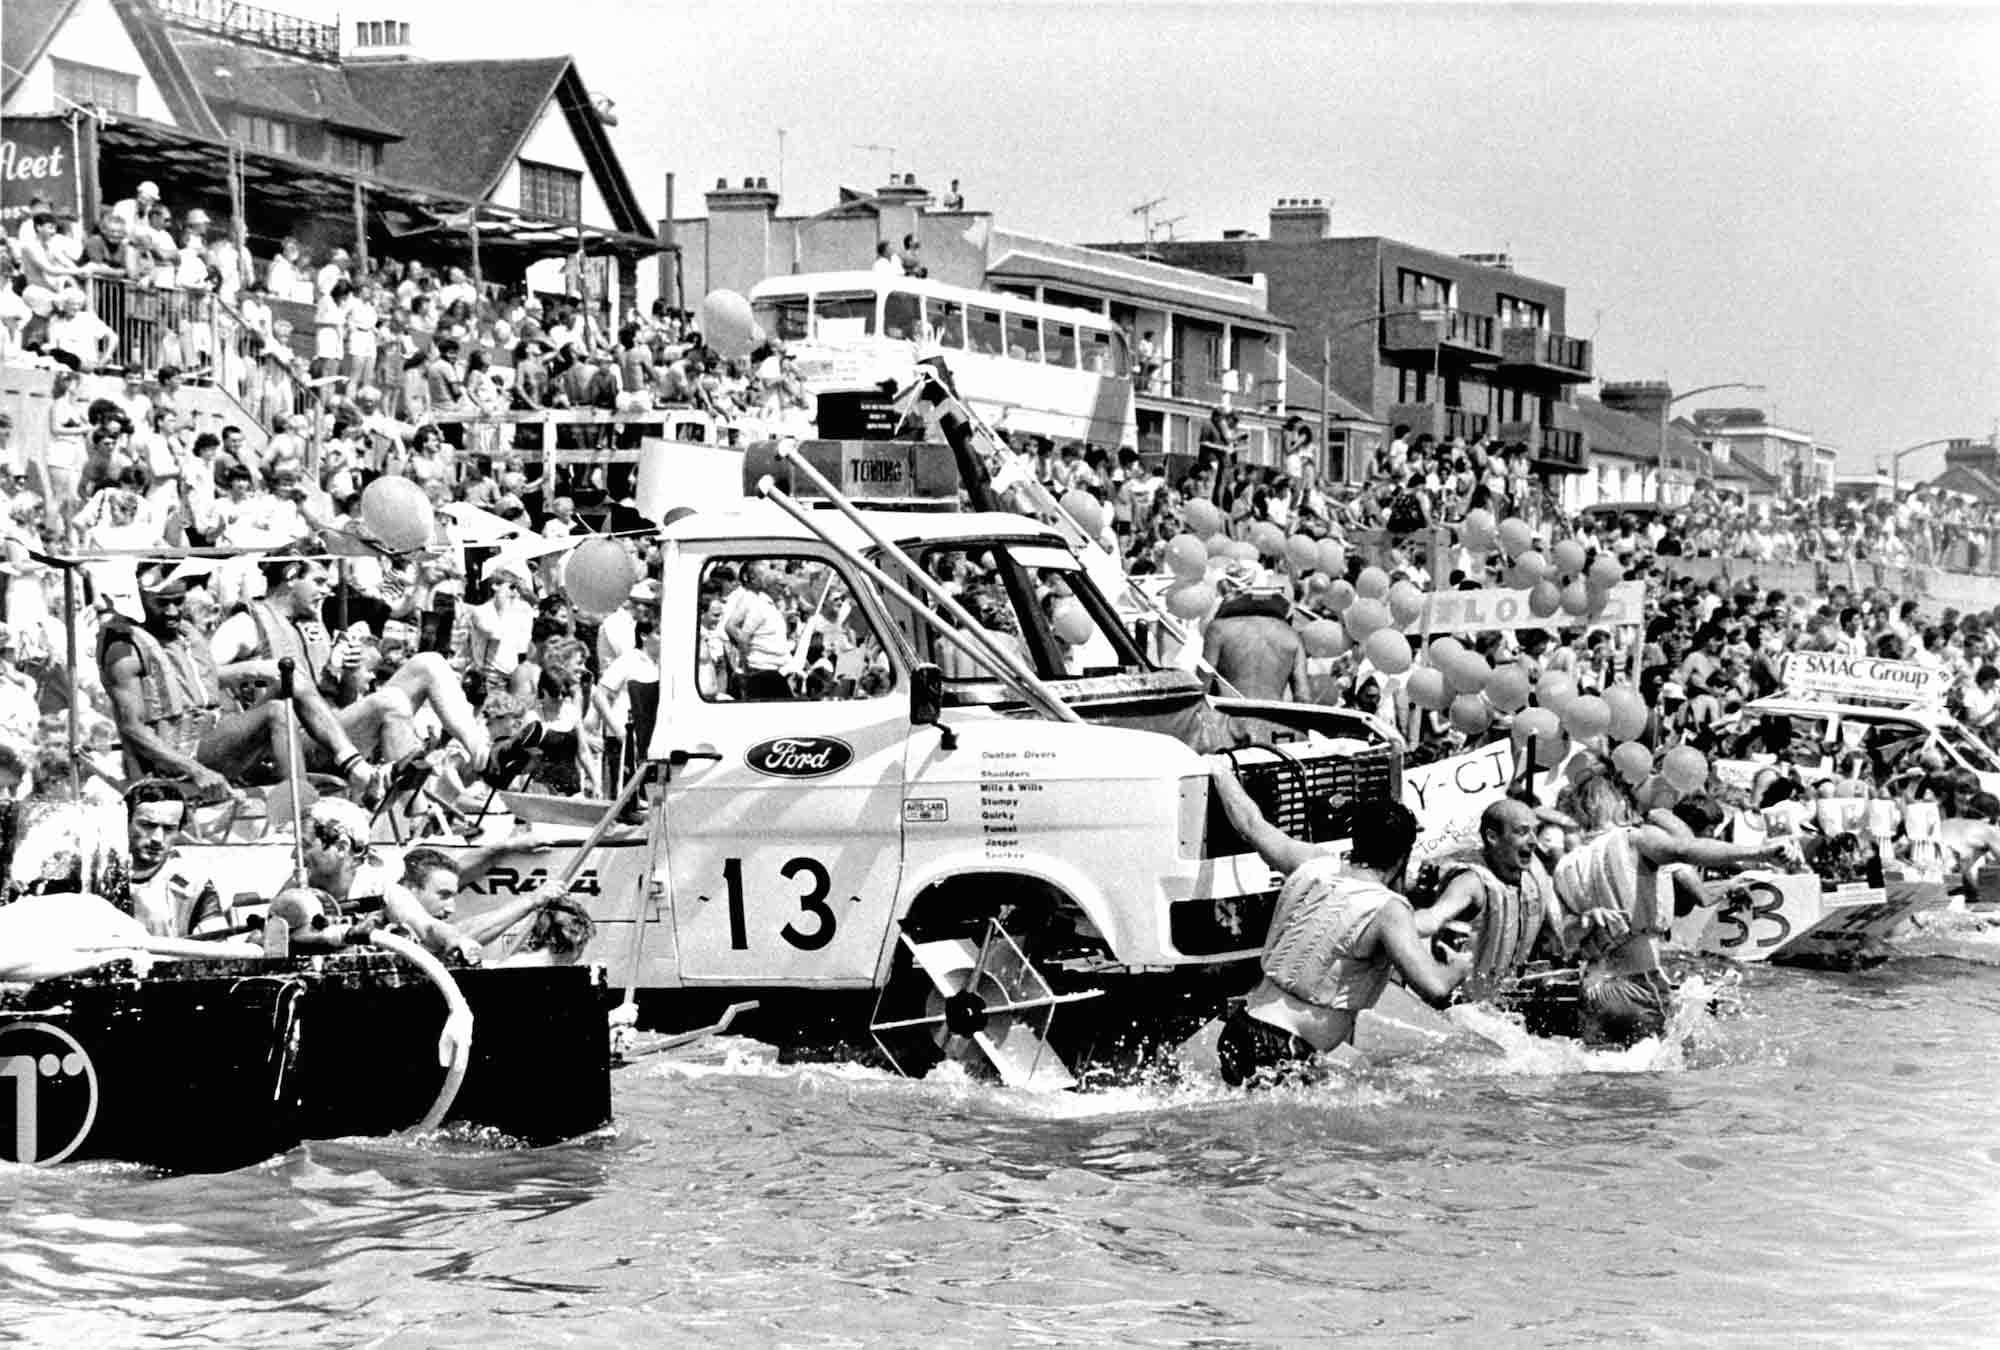 Als Teilnehmer am Maldon Raft Race in Essex, gewonnen hat er nicht…